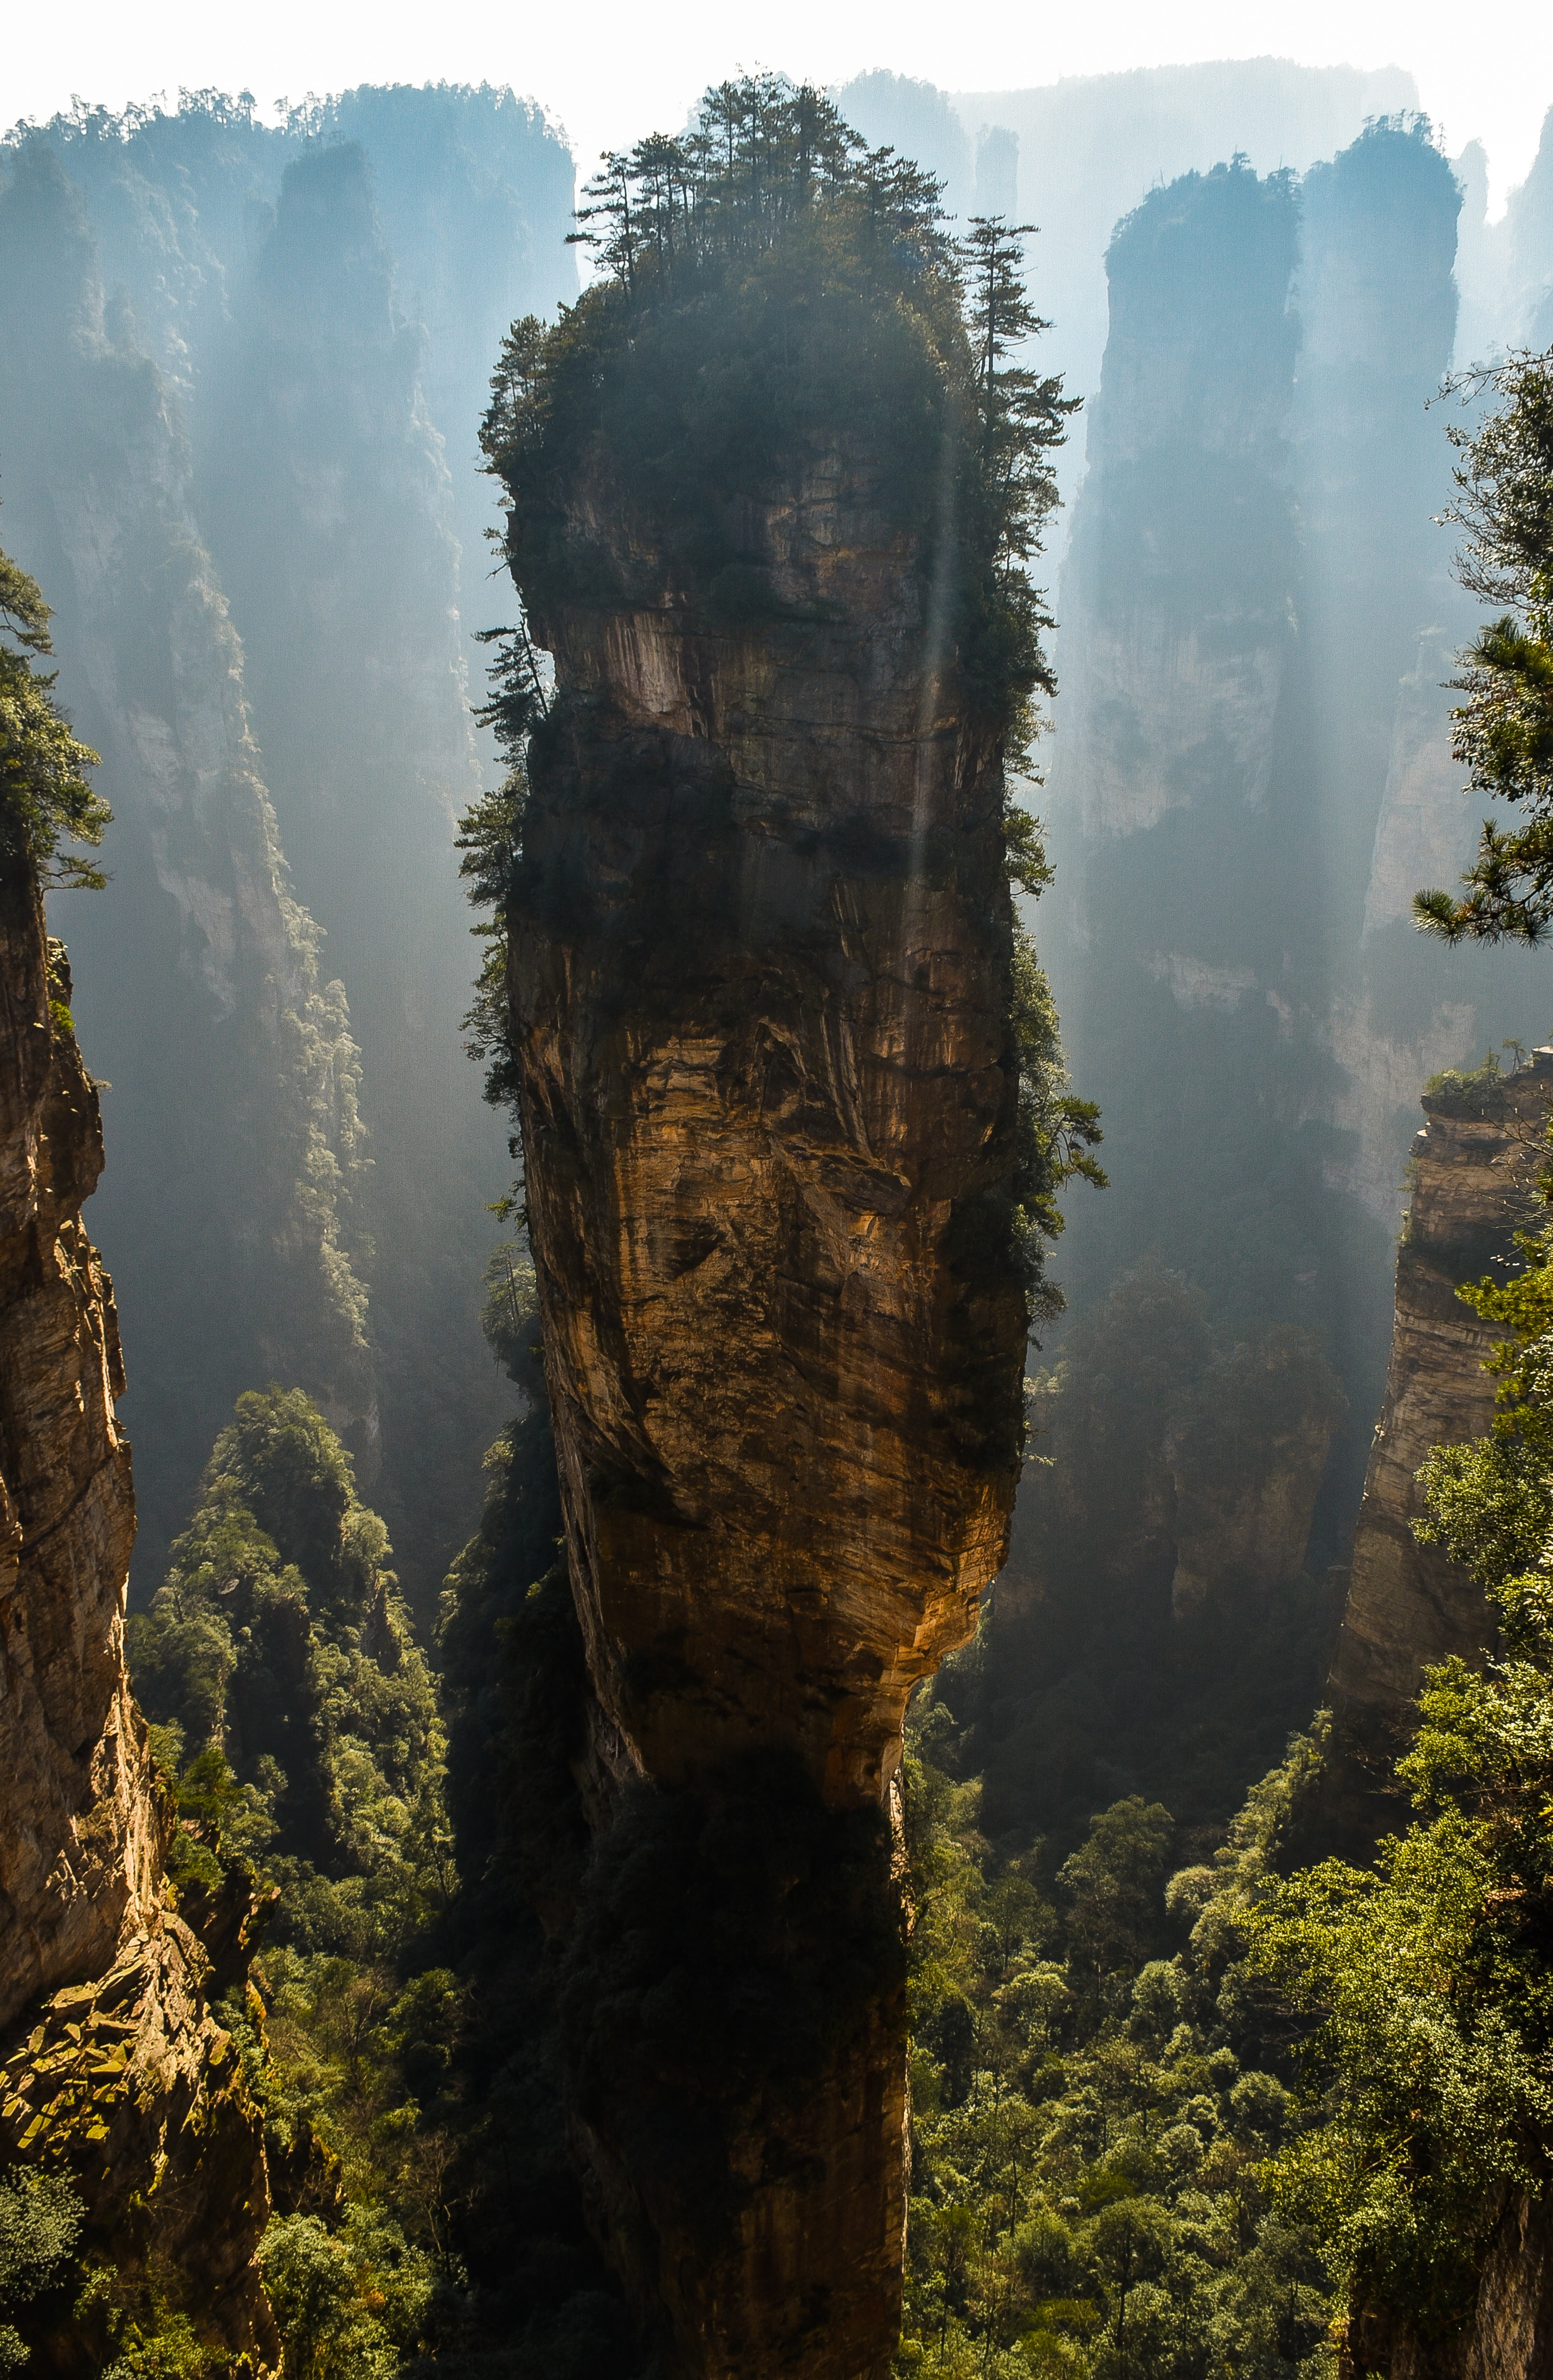 77801 download wallpaper Nature, Rock, Mountain, Fog, China, Mount Avatar, Mountain Avatar, Zhangjiajie, Changjiajie screensavers and pictures for free